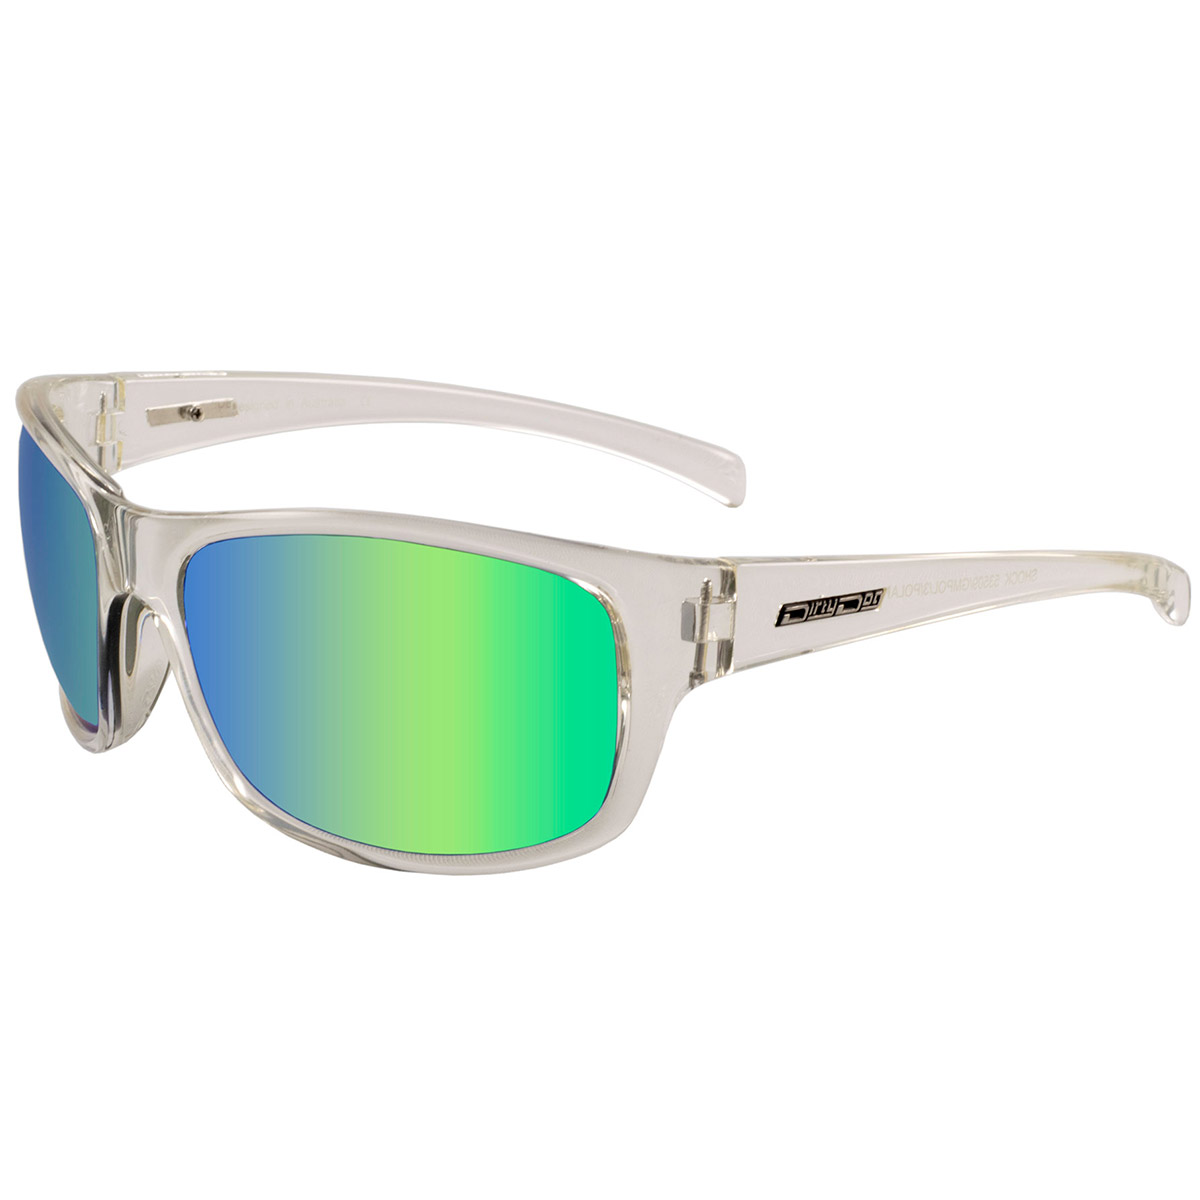 8db0042d87f Dirty Dog Shock Polarised Sunglasses from american golf